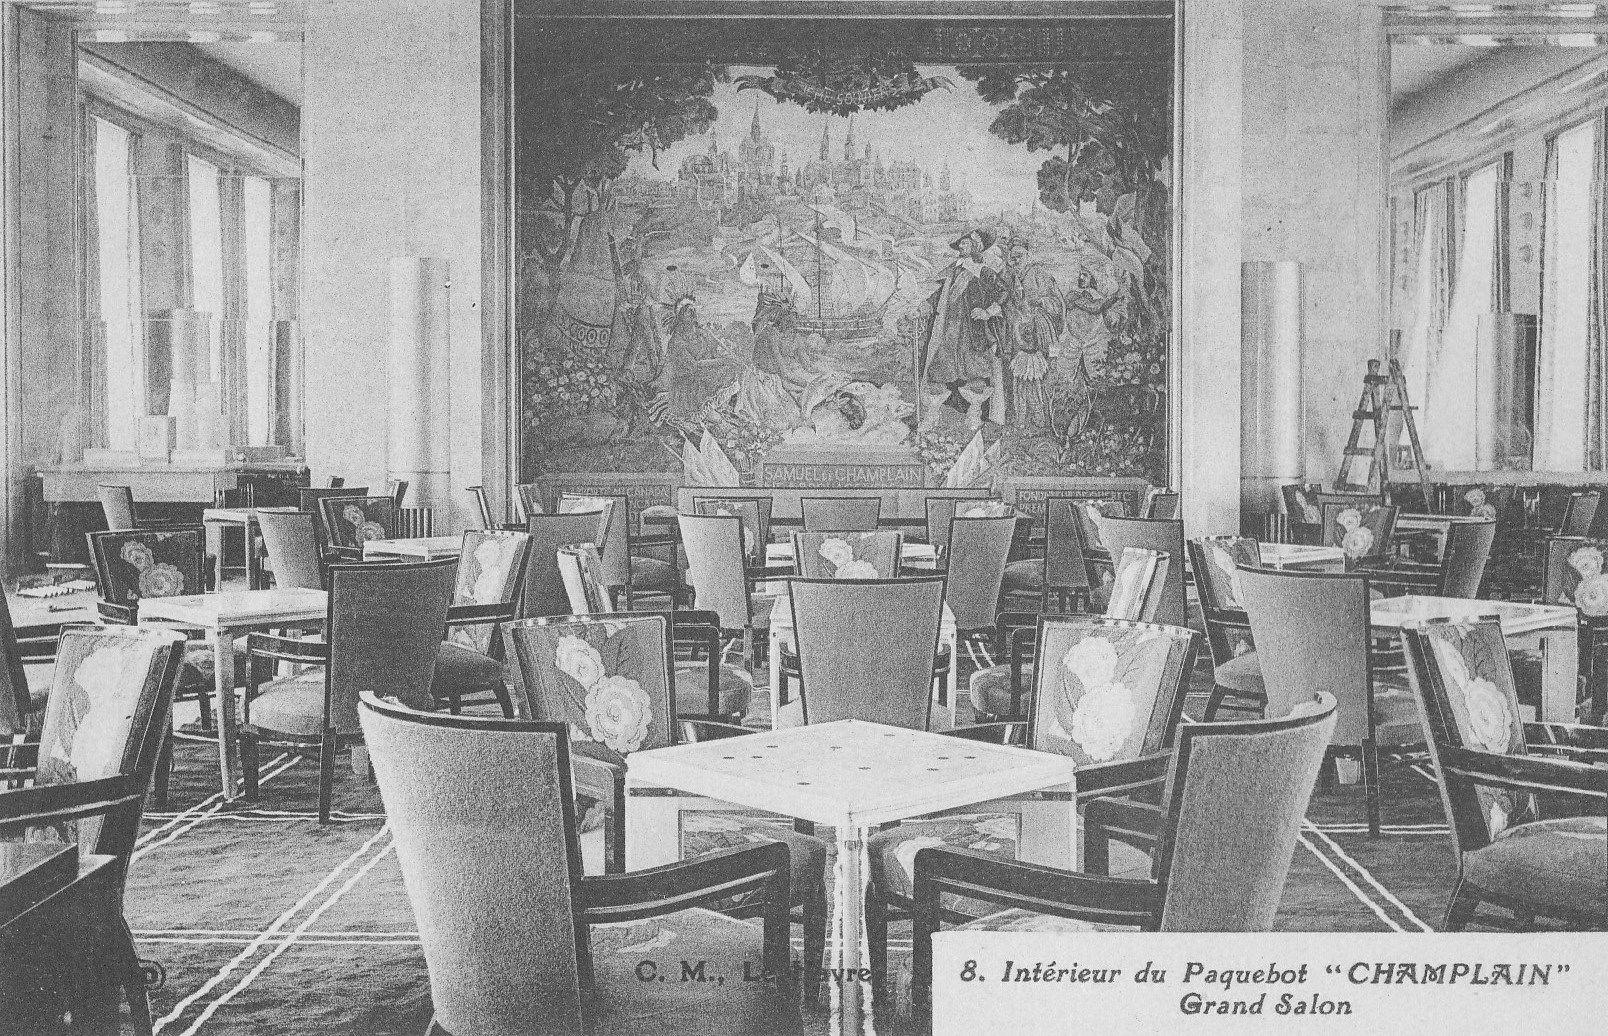 The First Class Grand Salon (Lounge) of the Champlain, cabin class ...